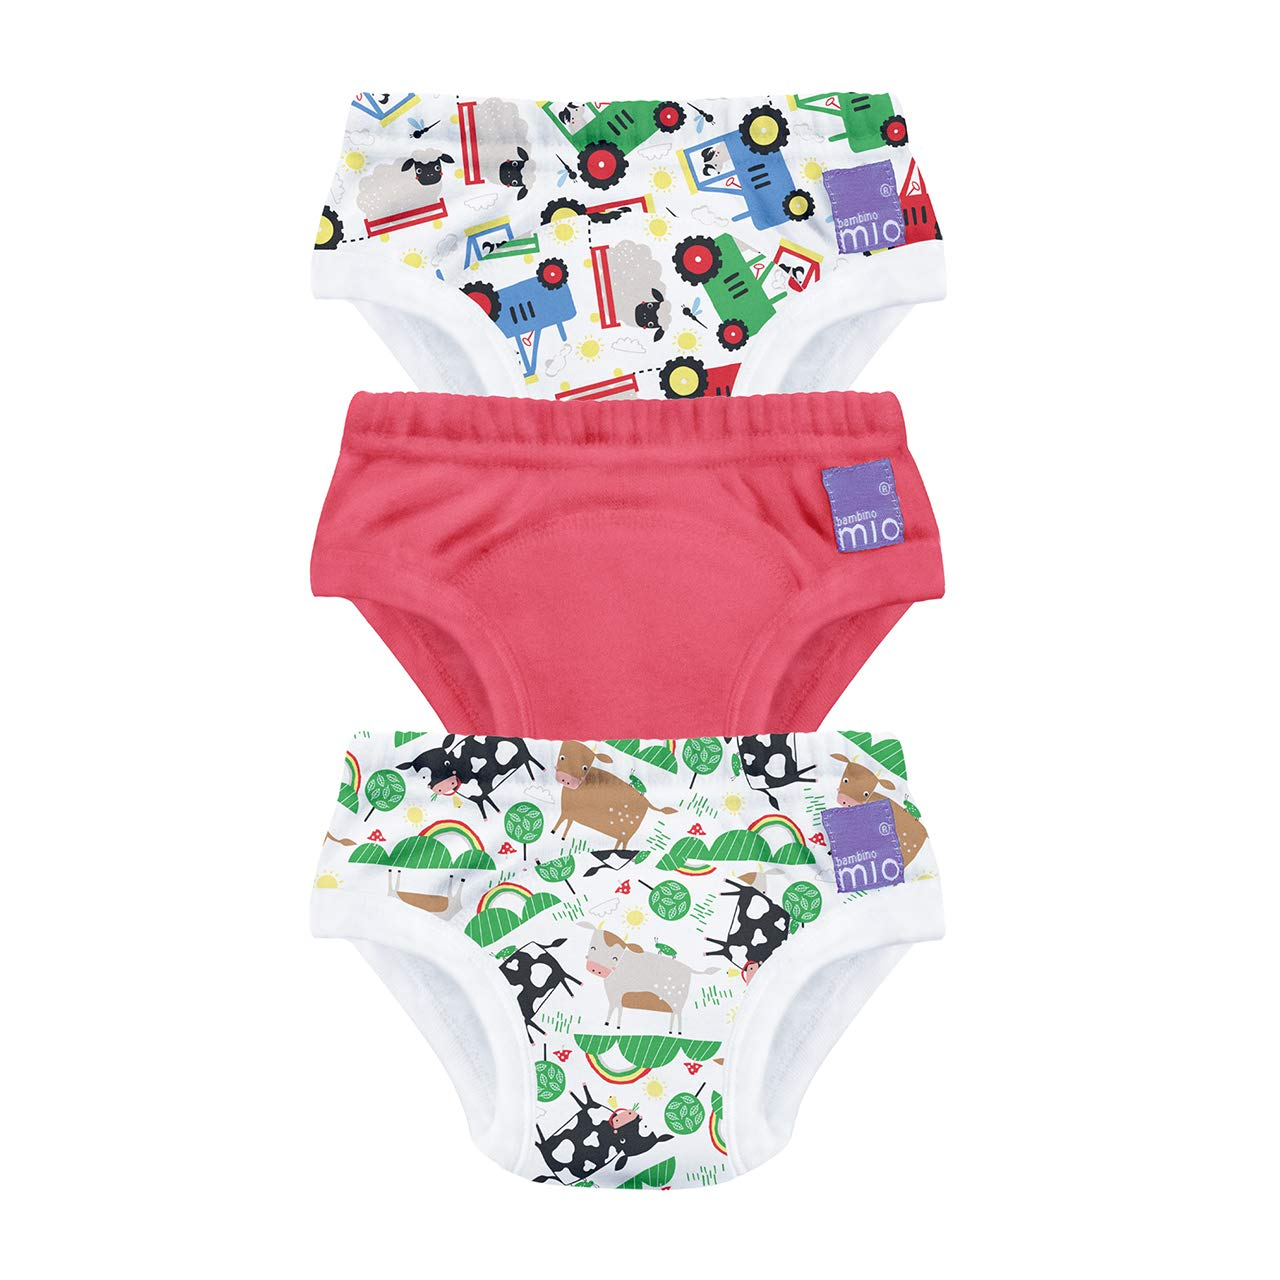 Bambino Mio Bambino Mio, Potty Training Pants, Farmer Friends, 3+ Years, 3 Pack